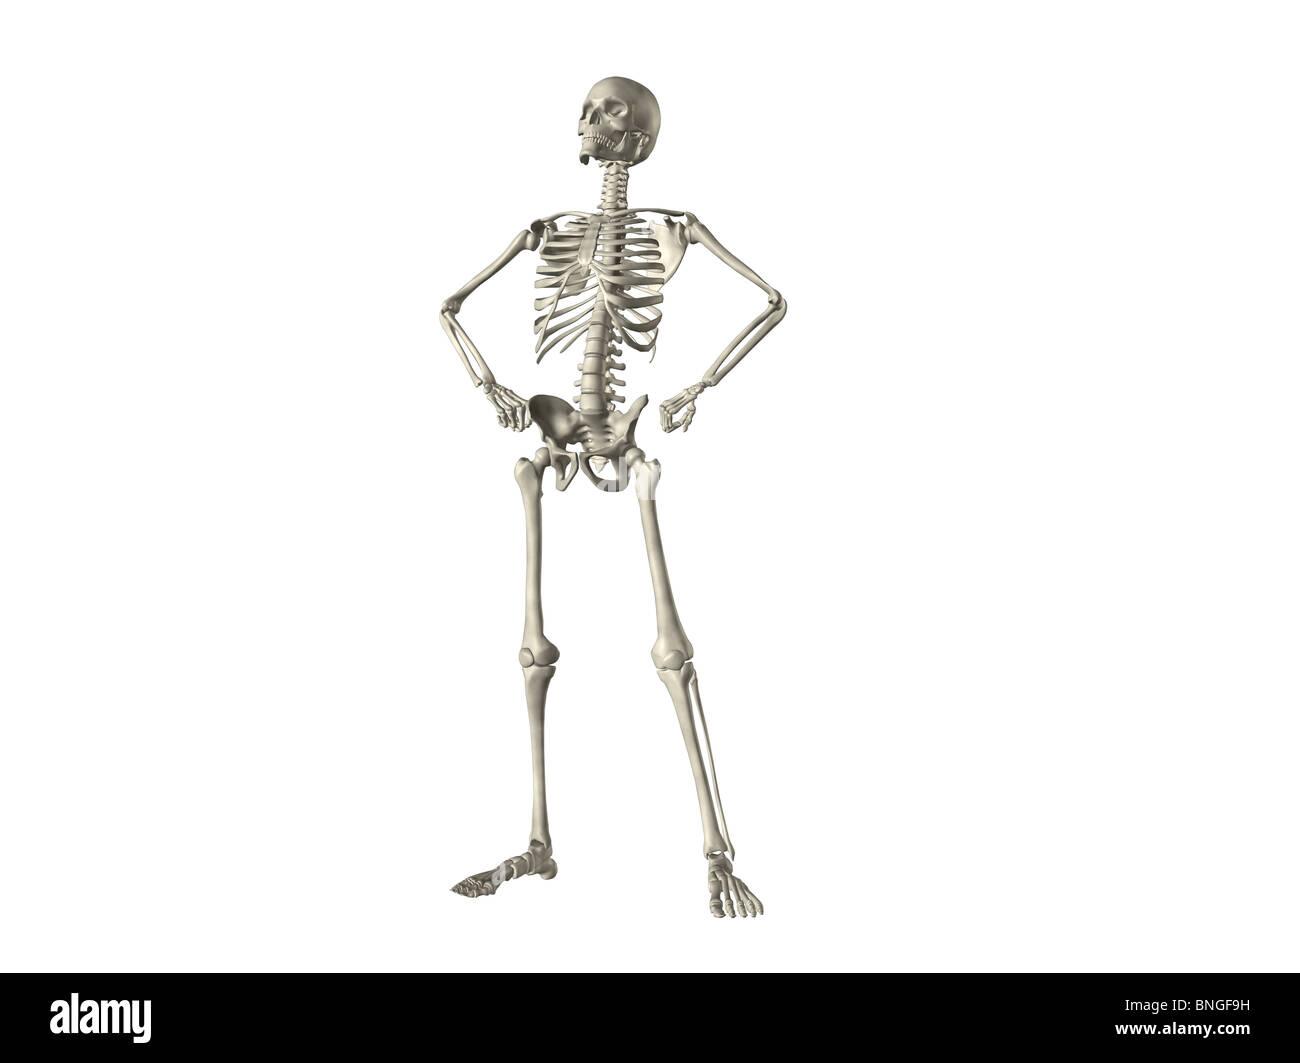 X Ray View Of A Human Skeleton Posing Stock Photo 30481405 Alamy